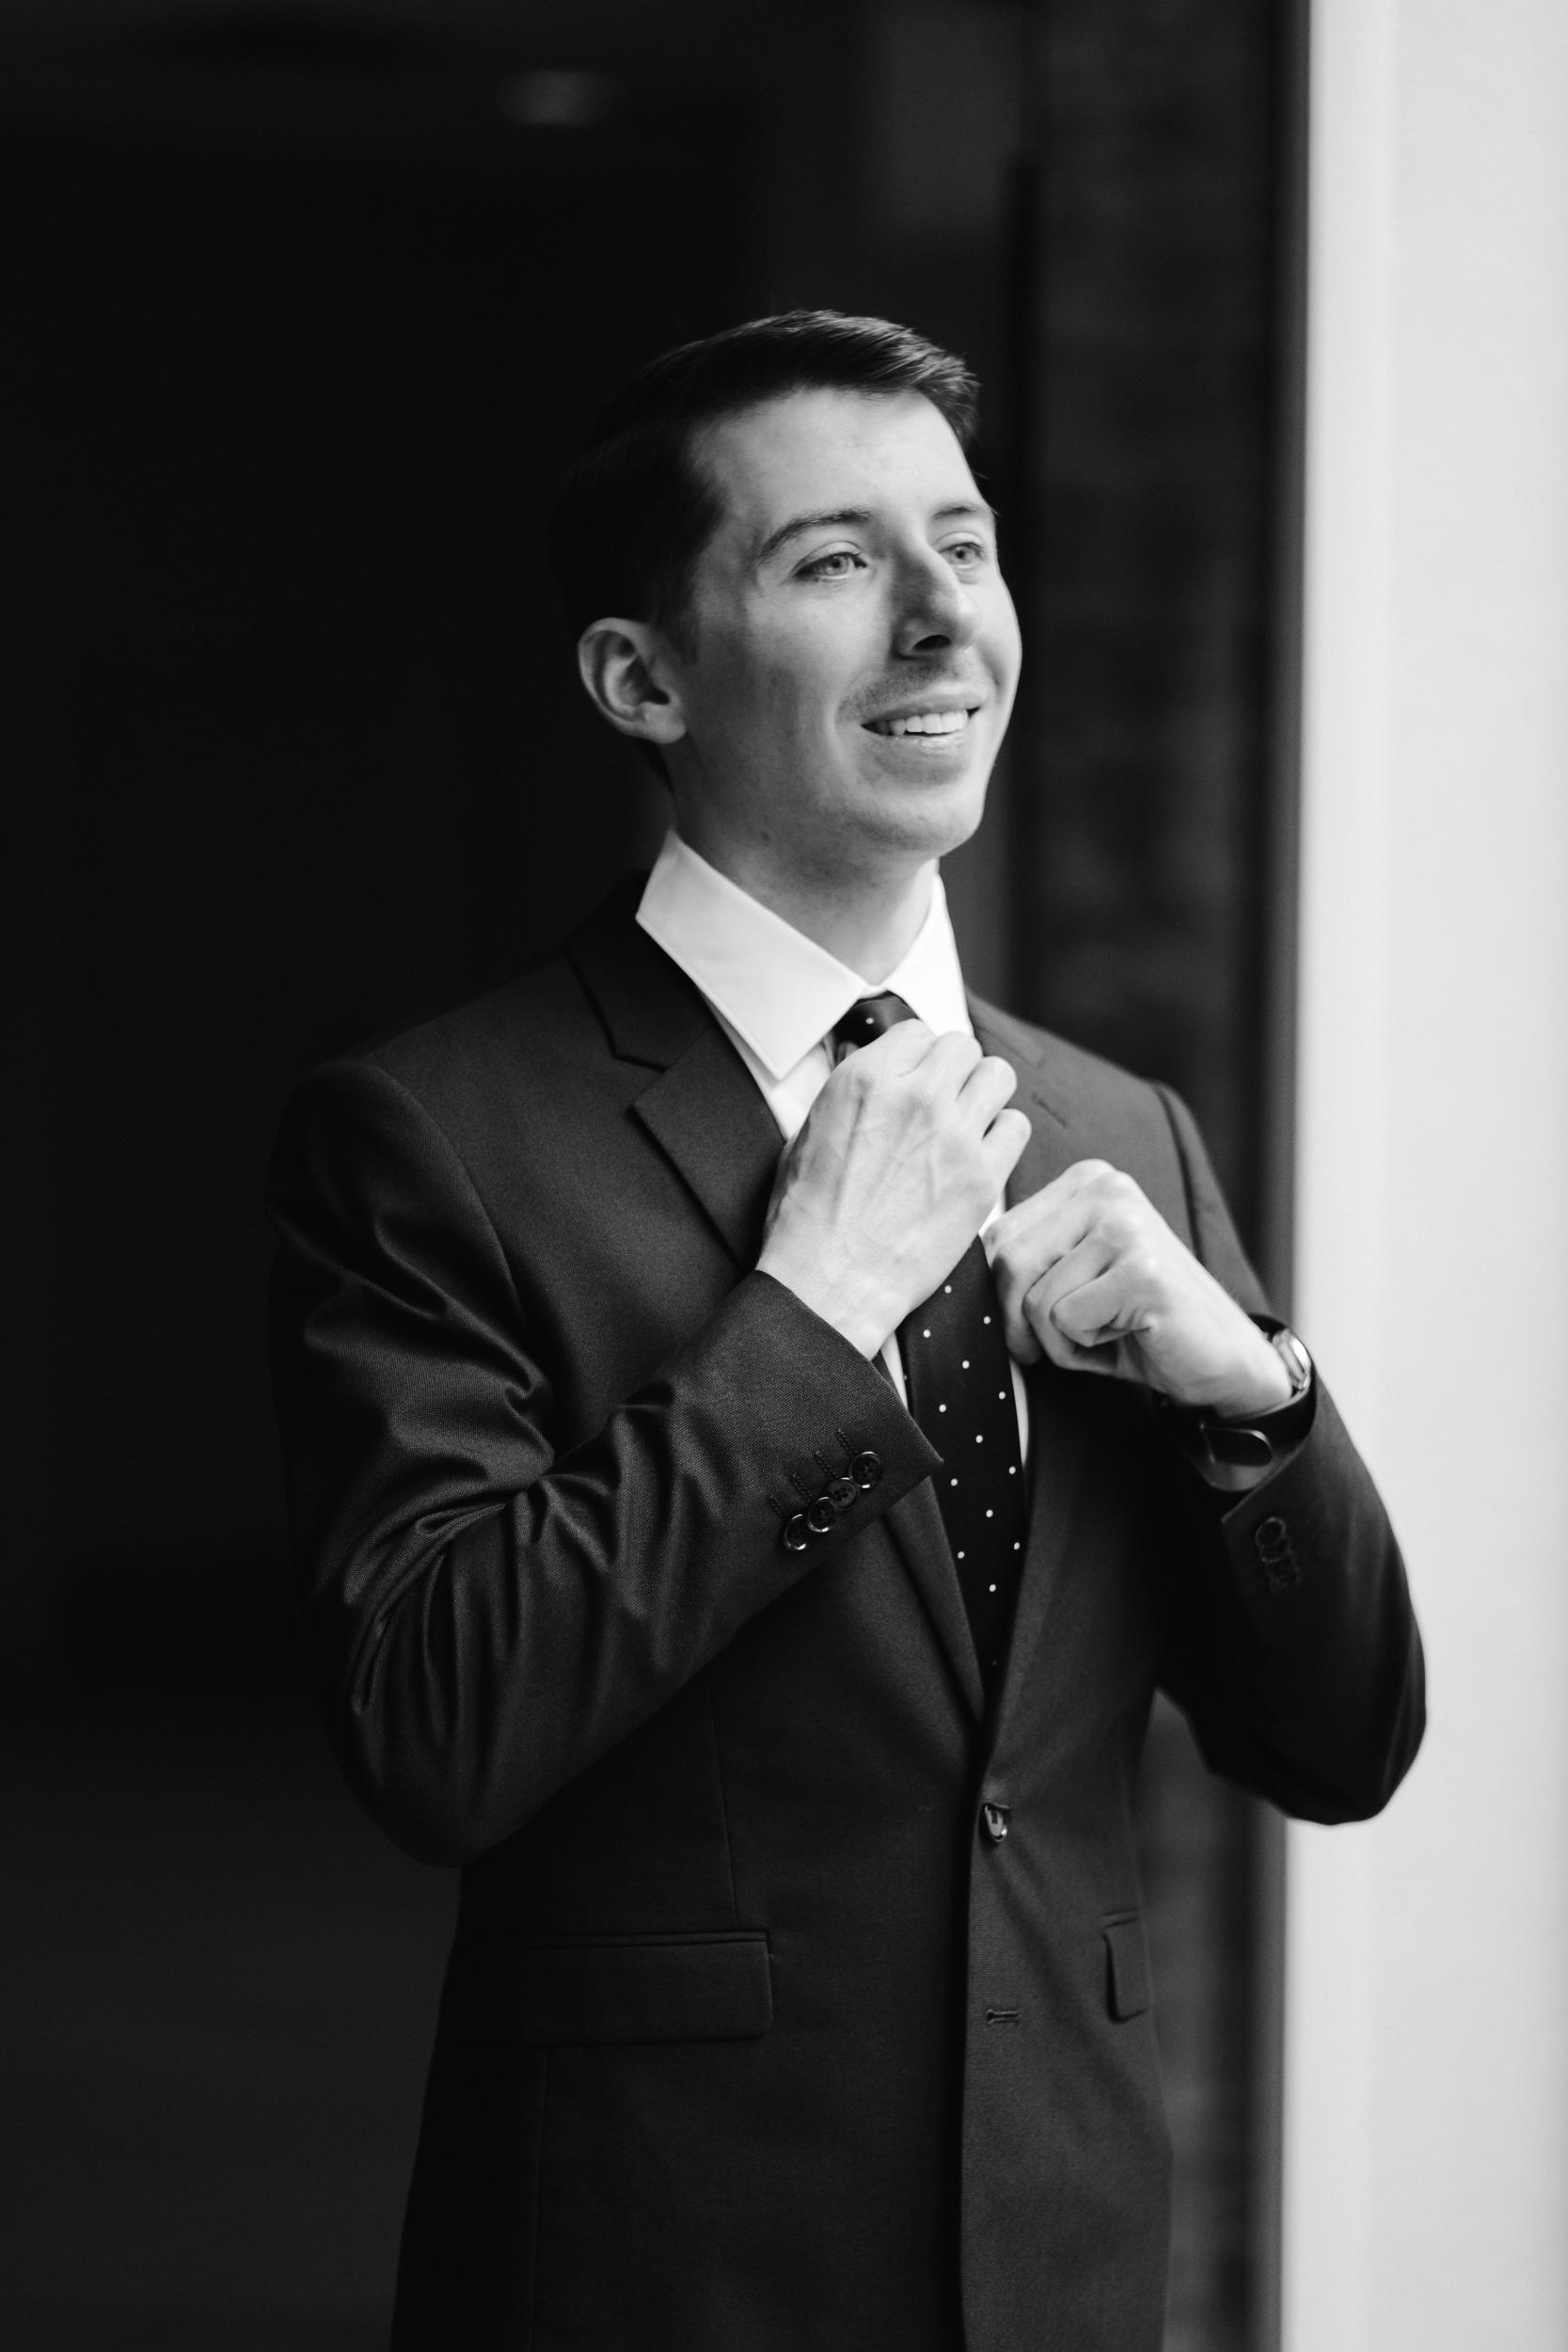 Wedding_Francis_Boucher_smith_barn_2018-6.jpg